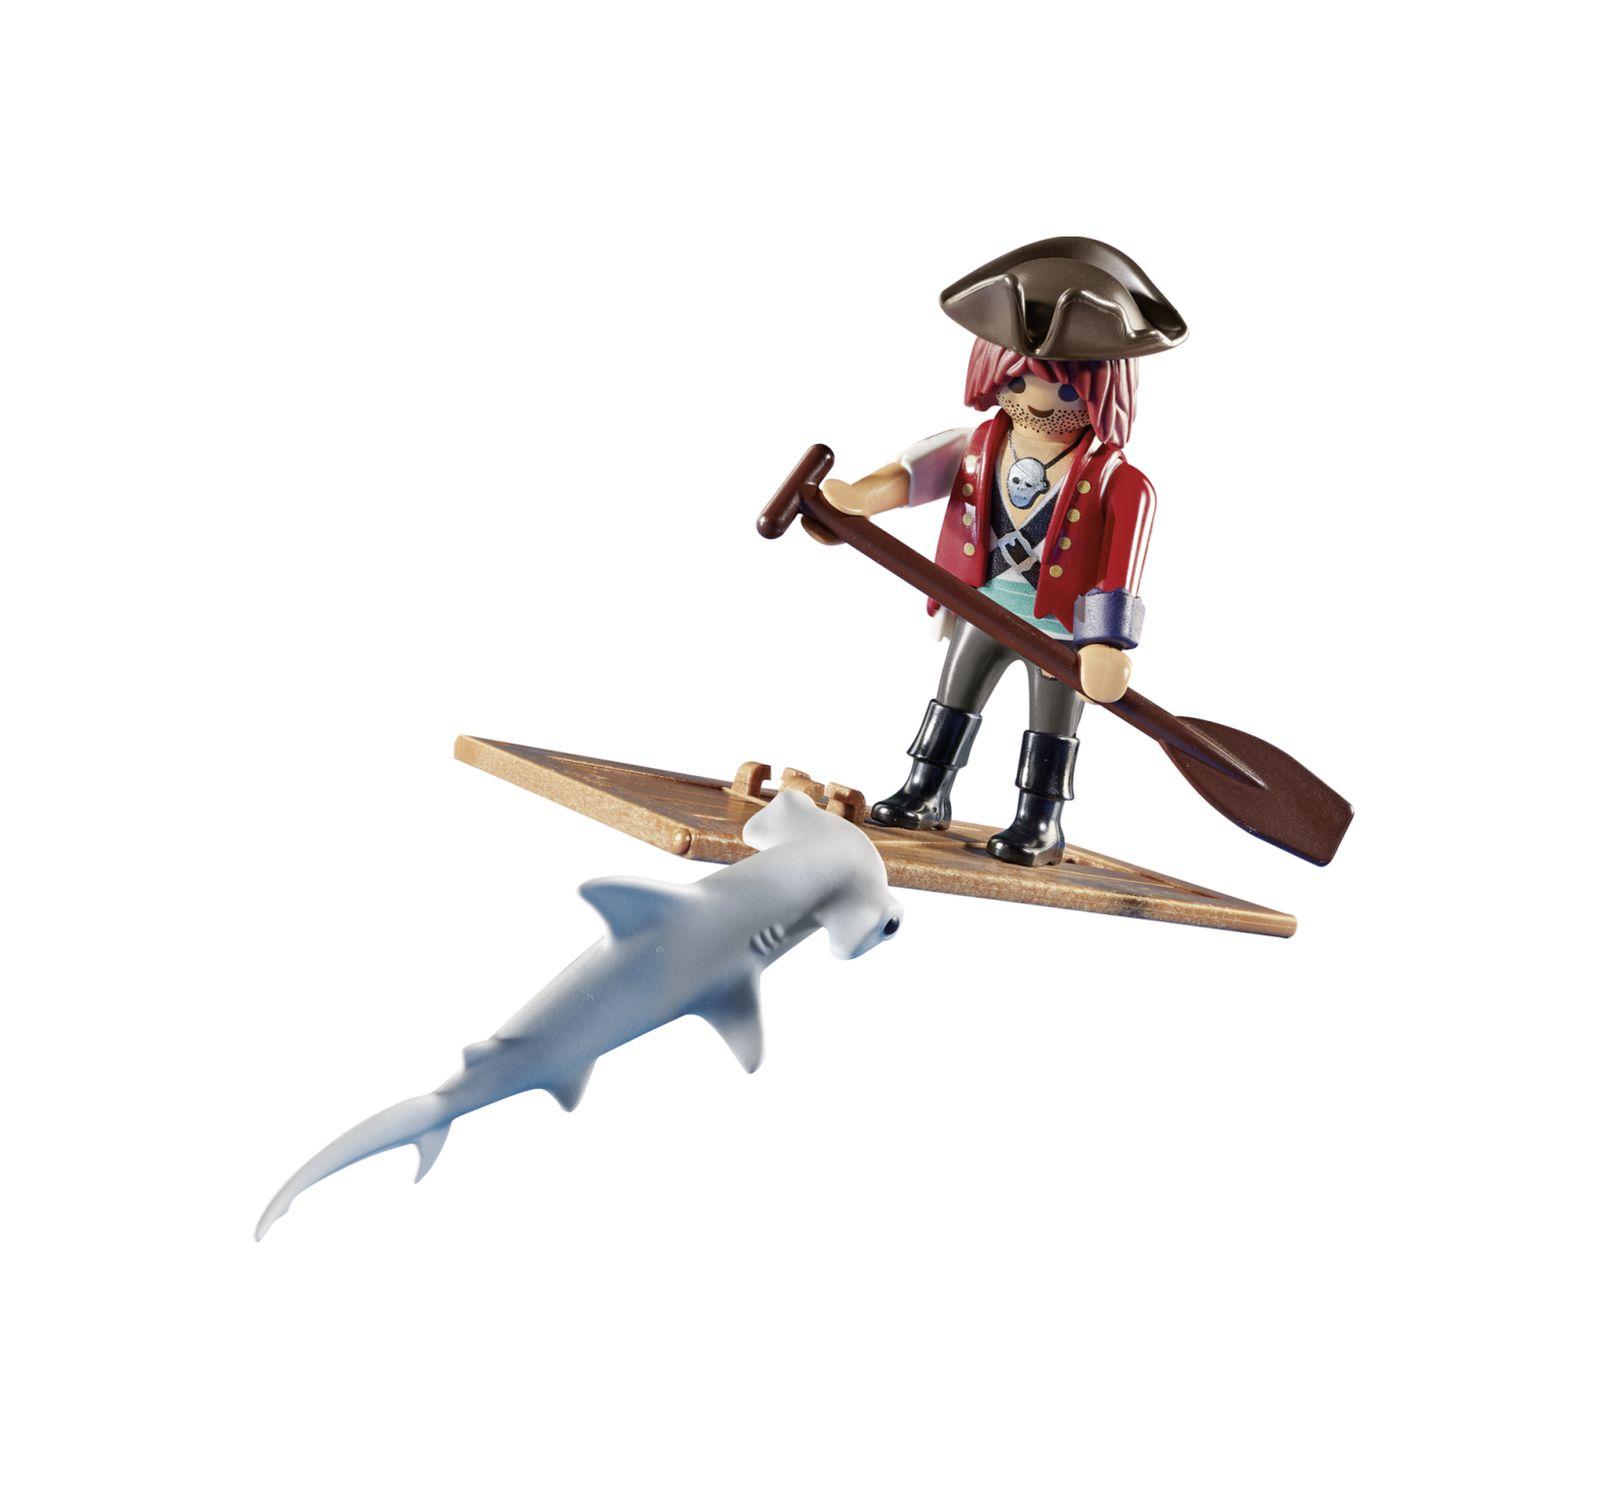 Pirata e squalo - Playmobil